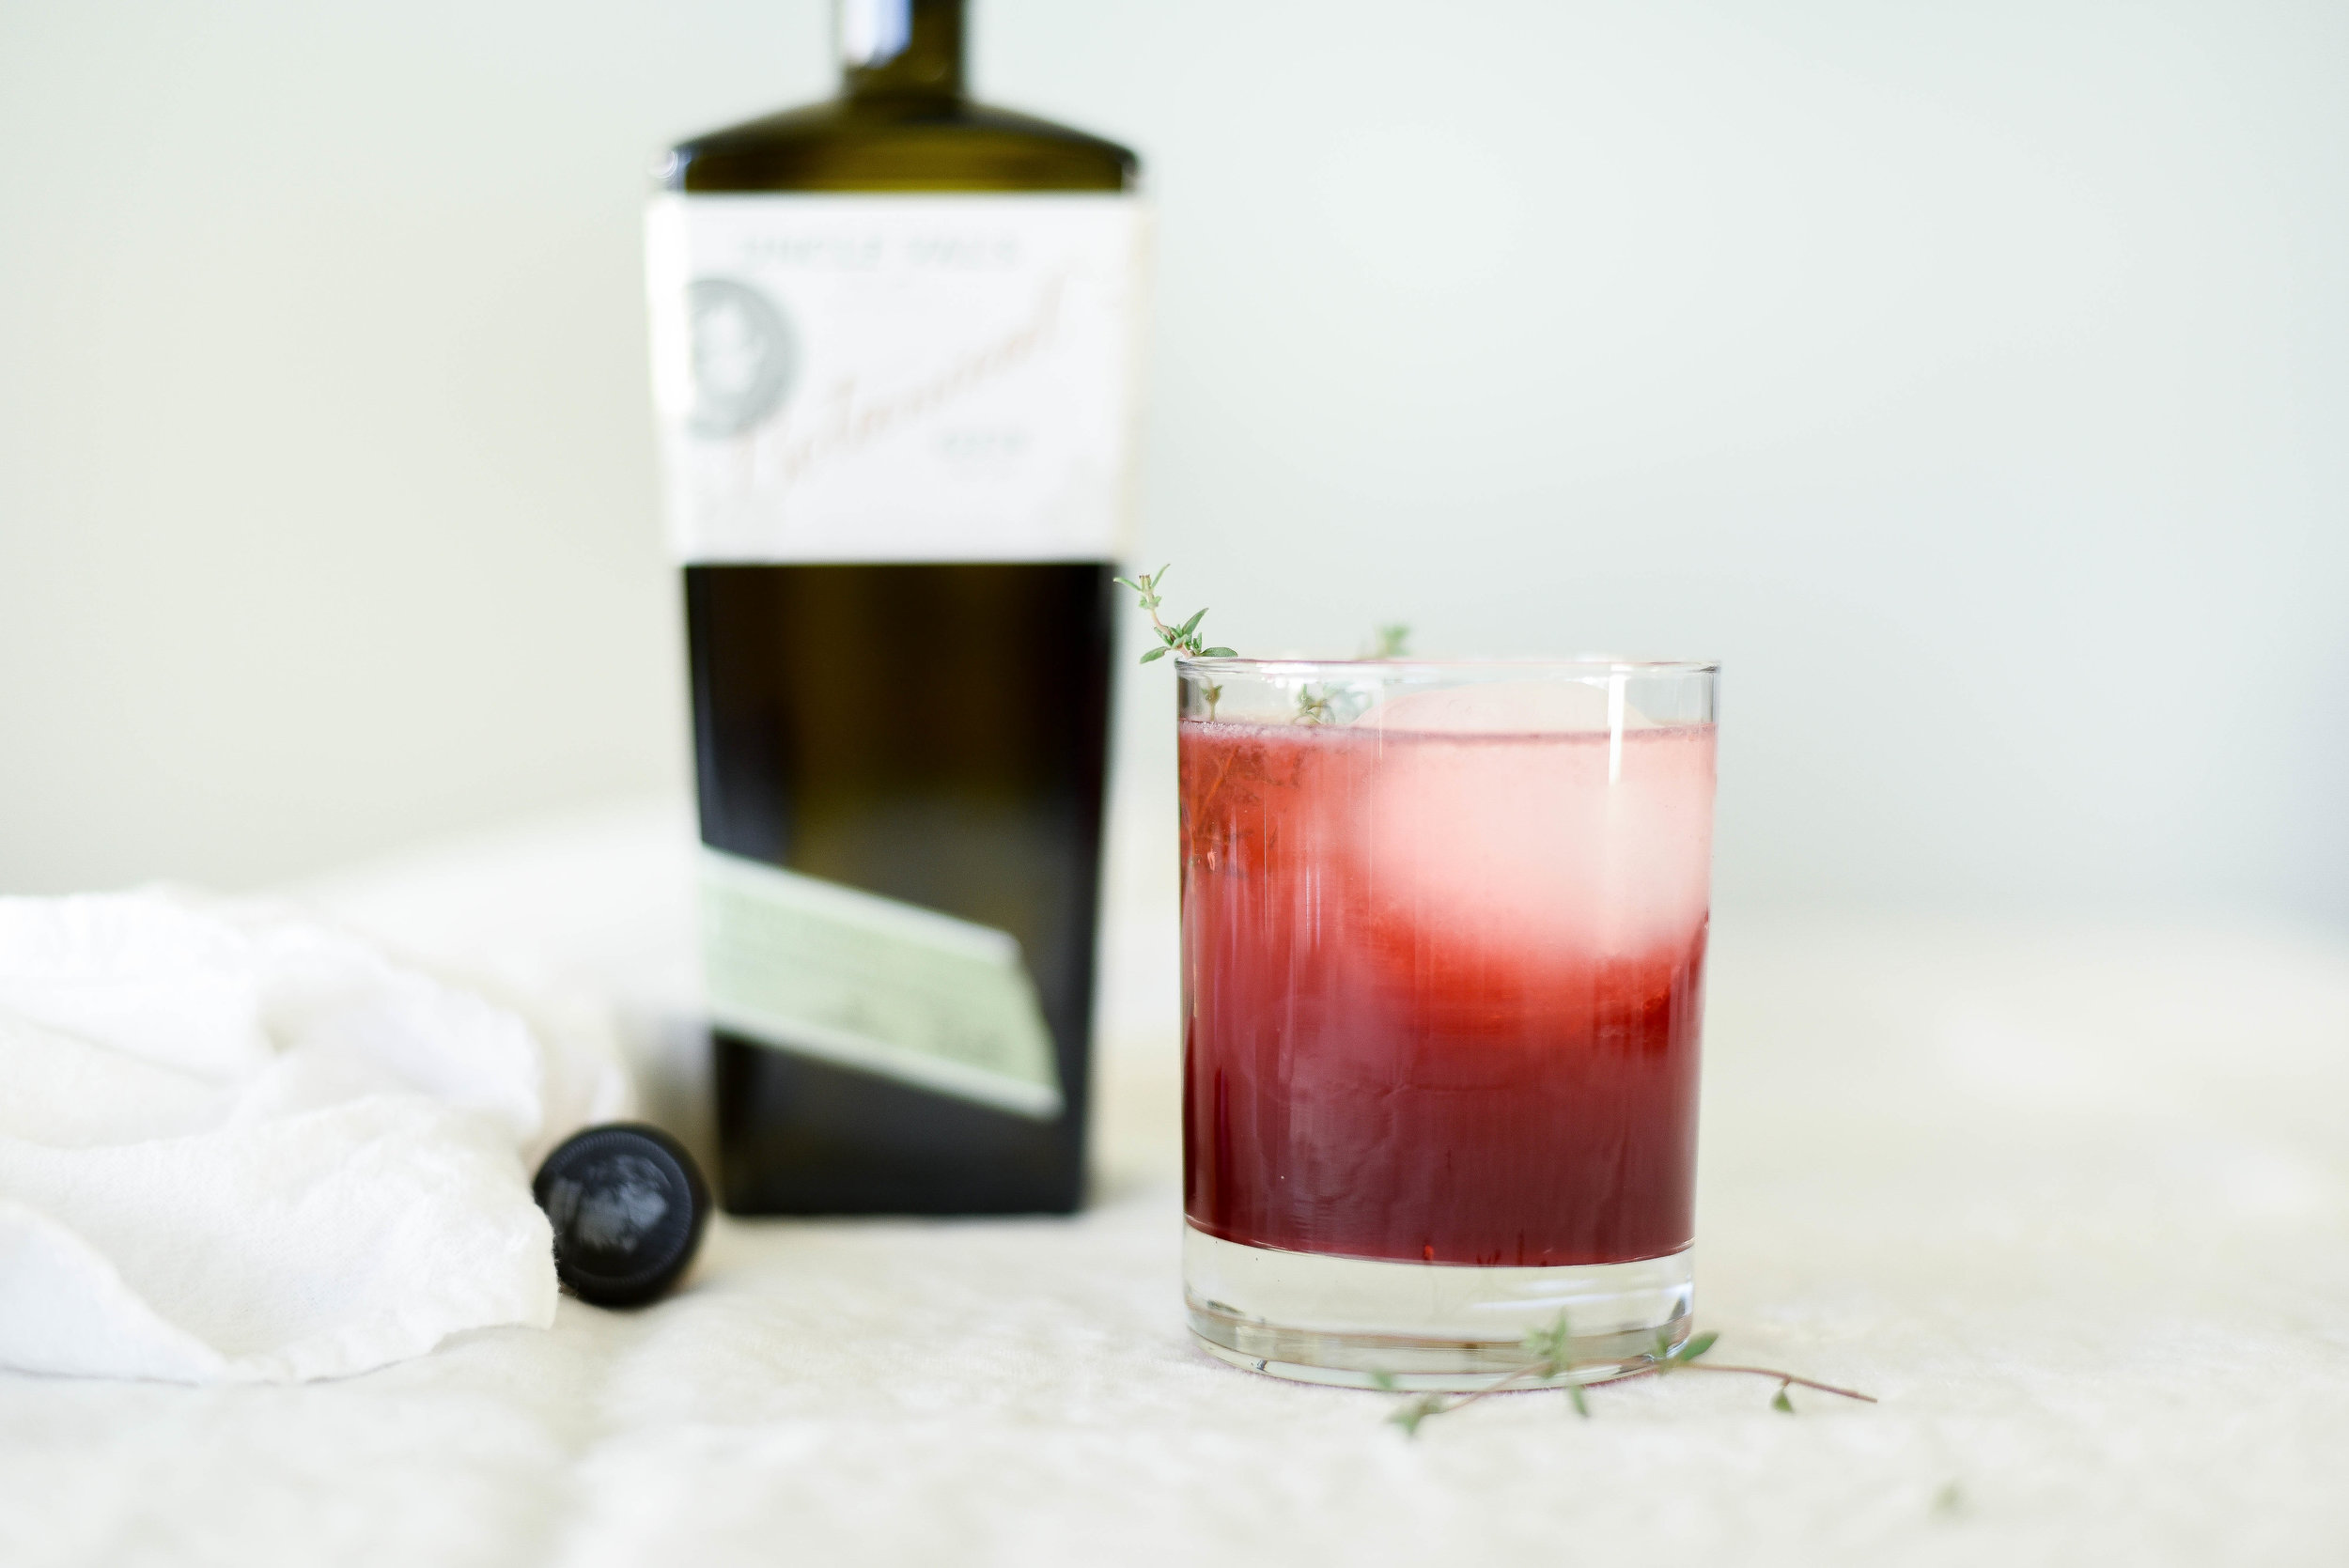 Blackberry gin lemonade recipe | asavvylifestyle.com